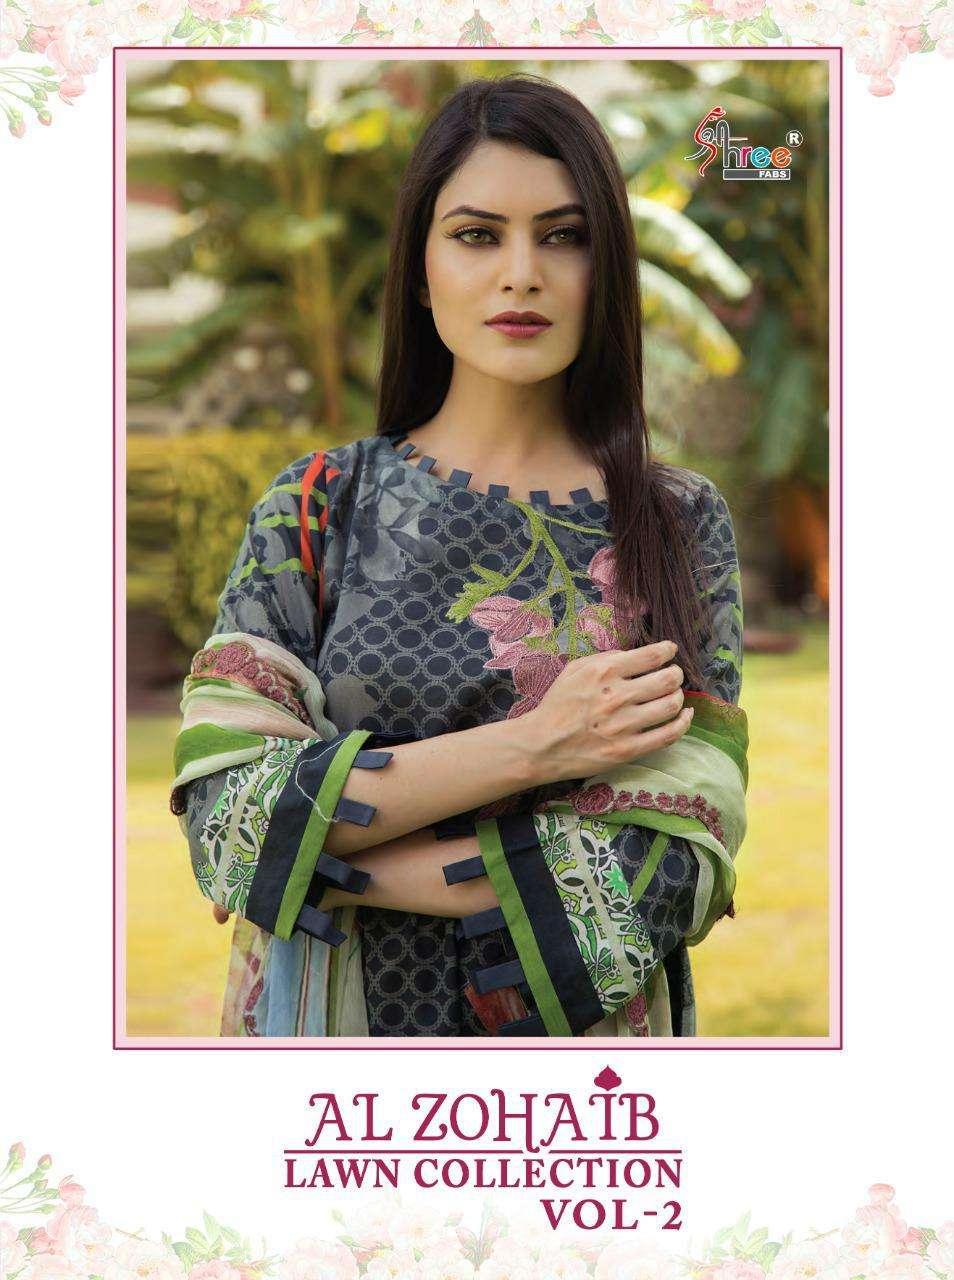 Al Zohaib Lawn Vol 2 By Shree Fabs Cotton Pakistani Suits